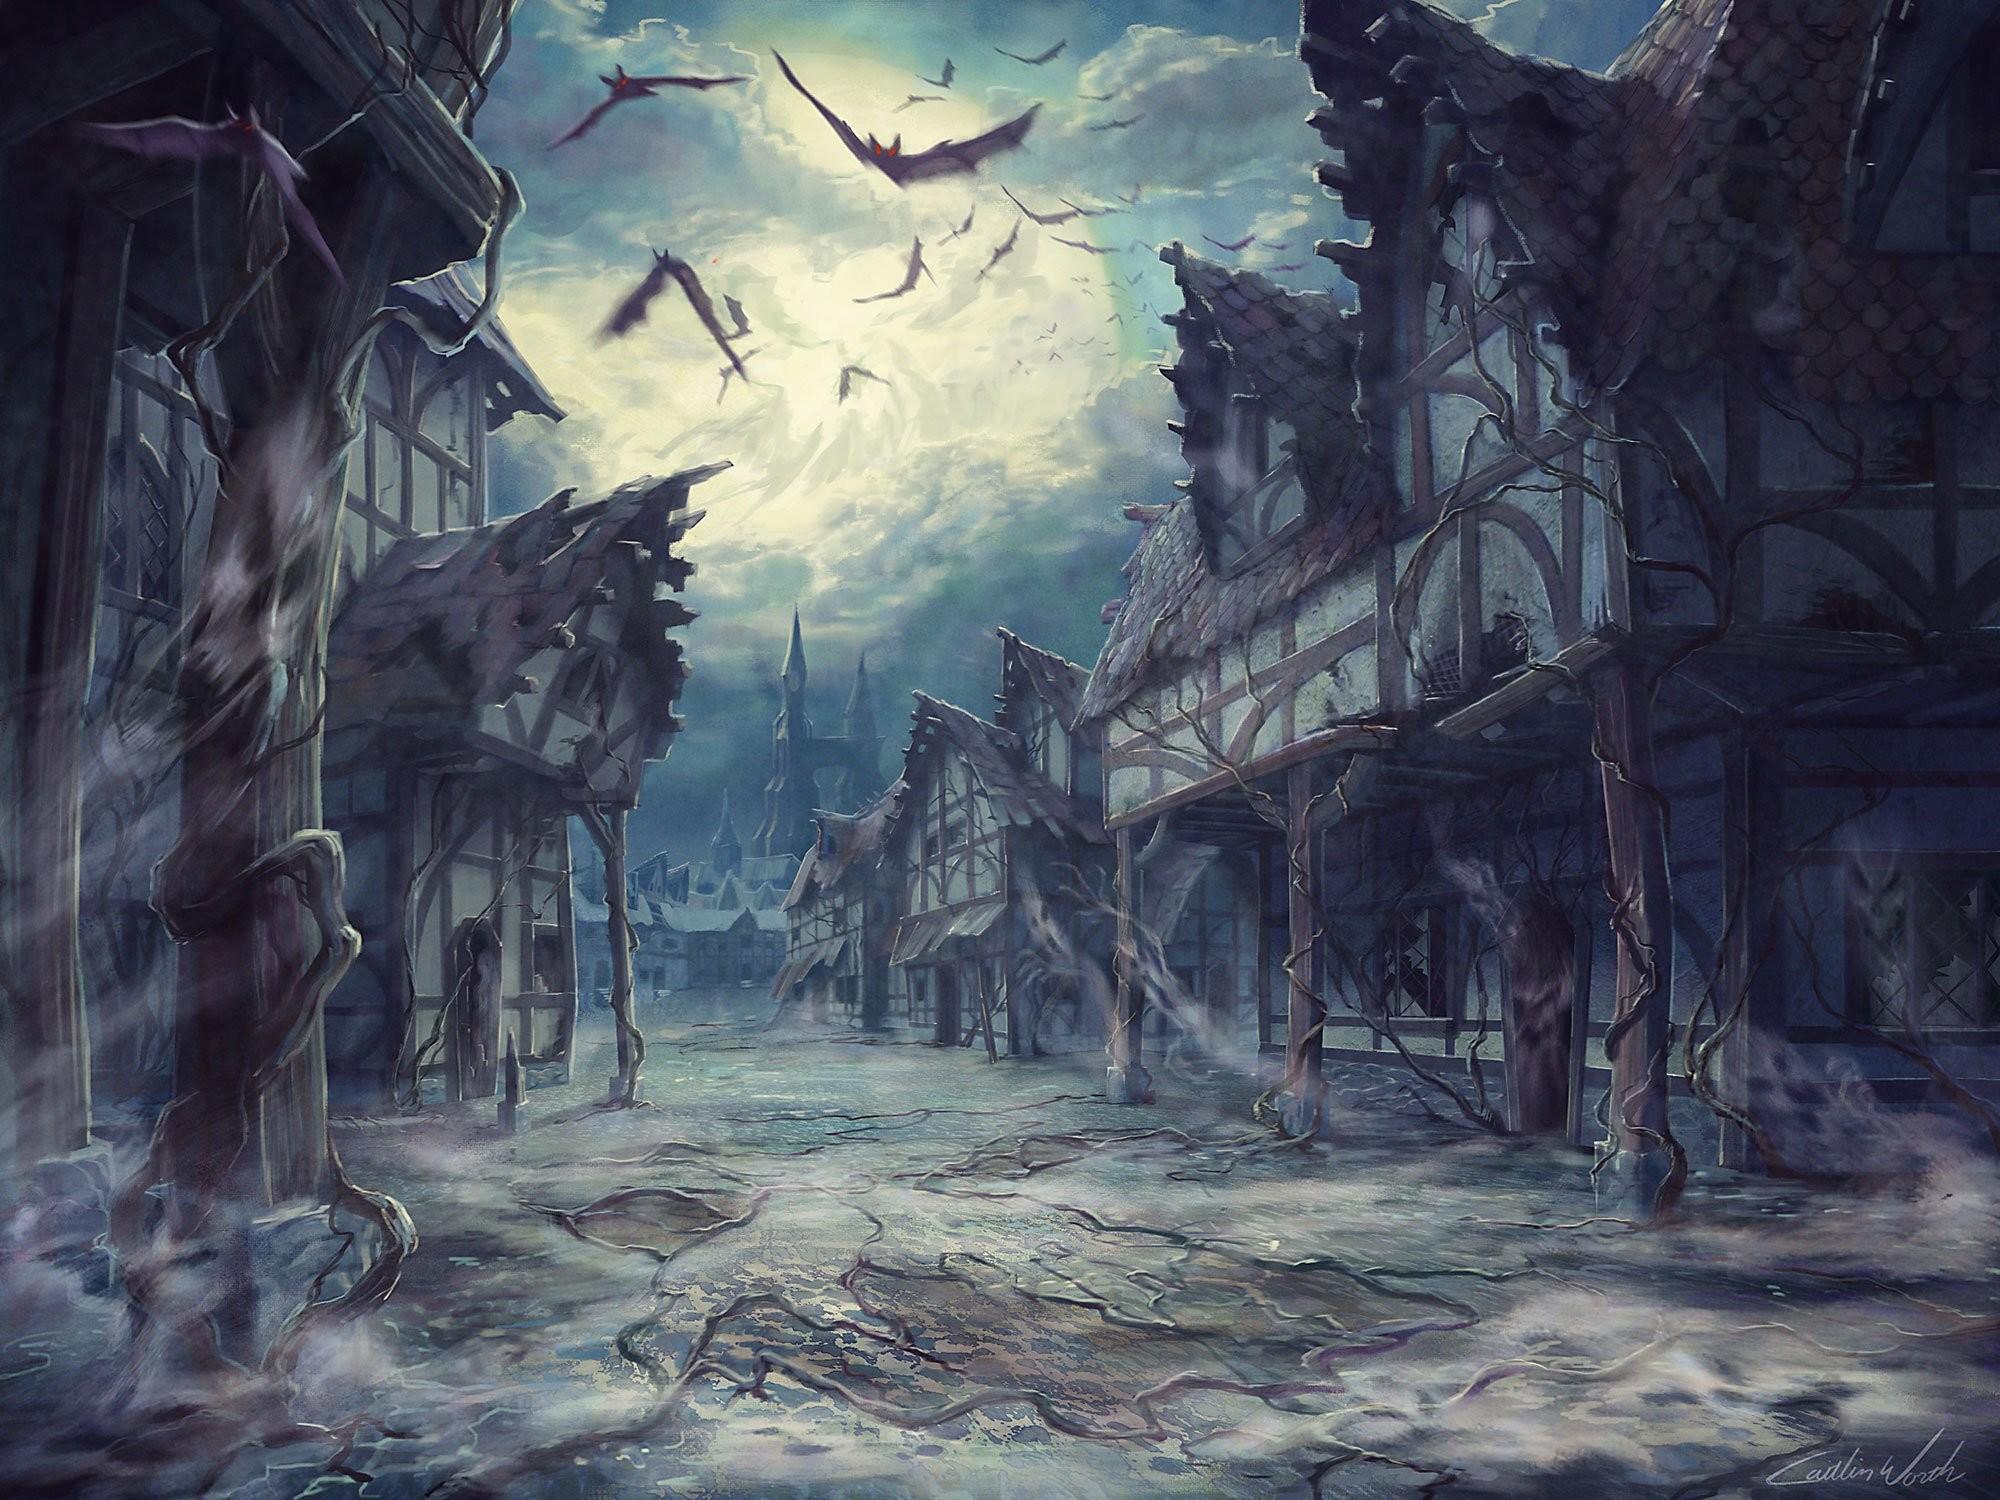 Moon, Horror, Halloweenstreet, Backgrounds,hd Abstract - Horror House Background Hd - HD Wallpaper